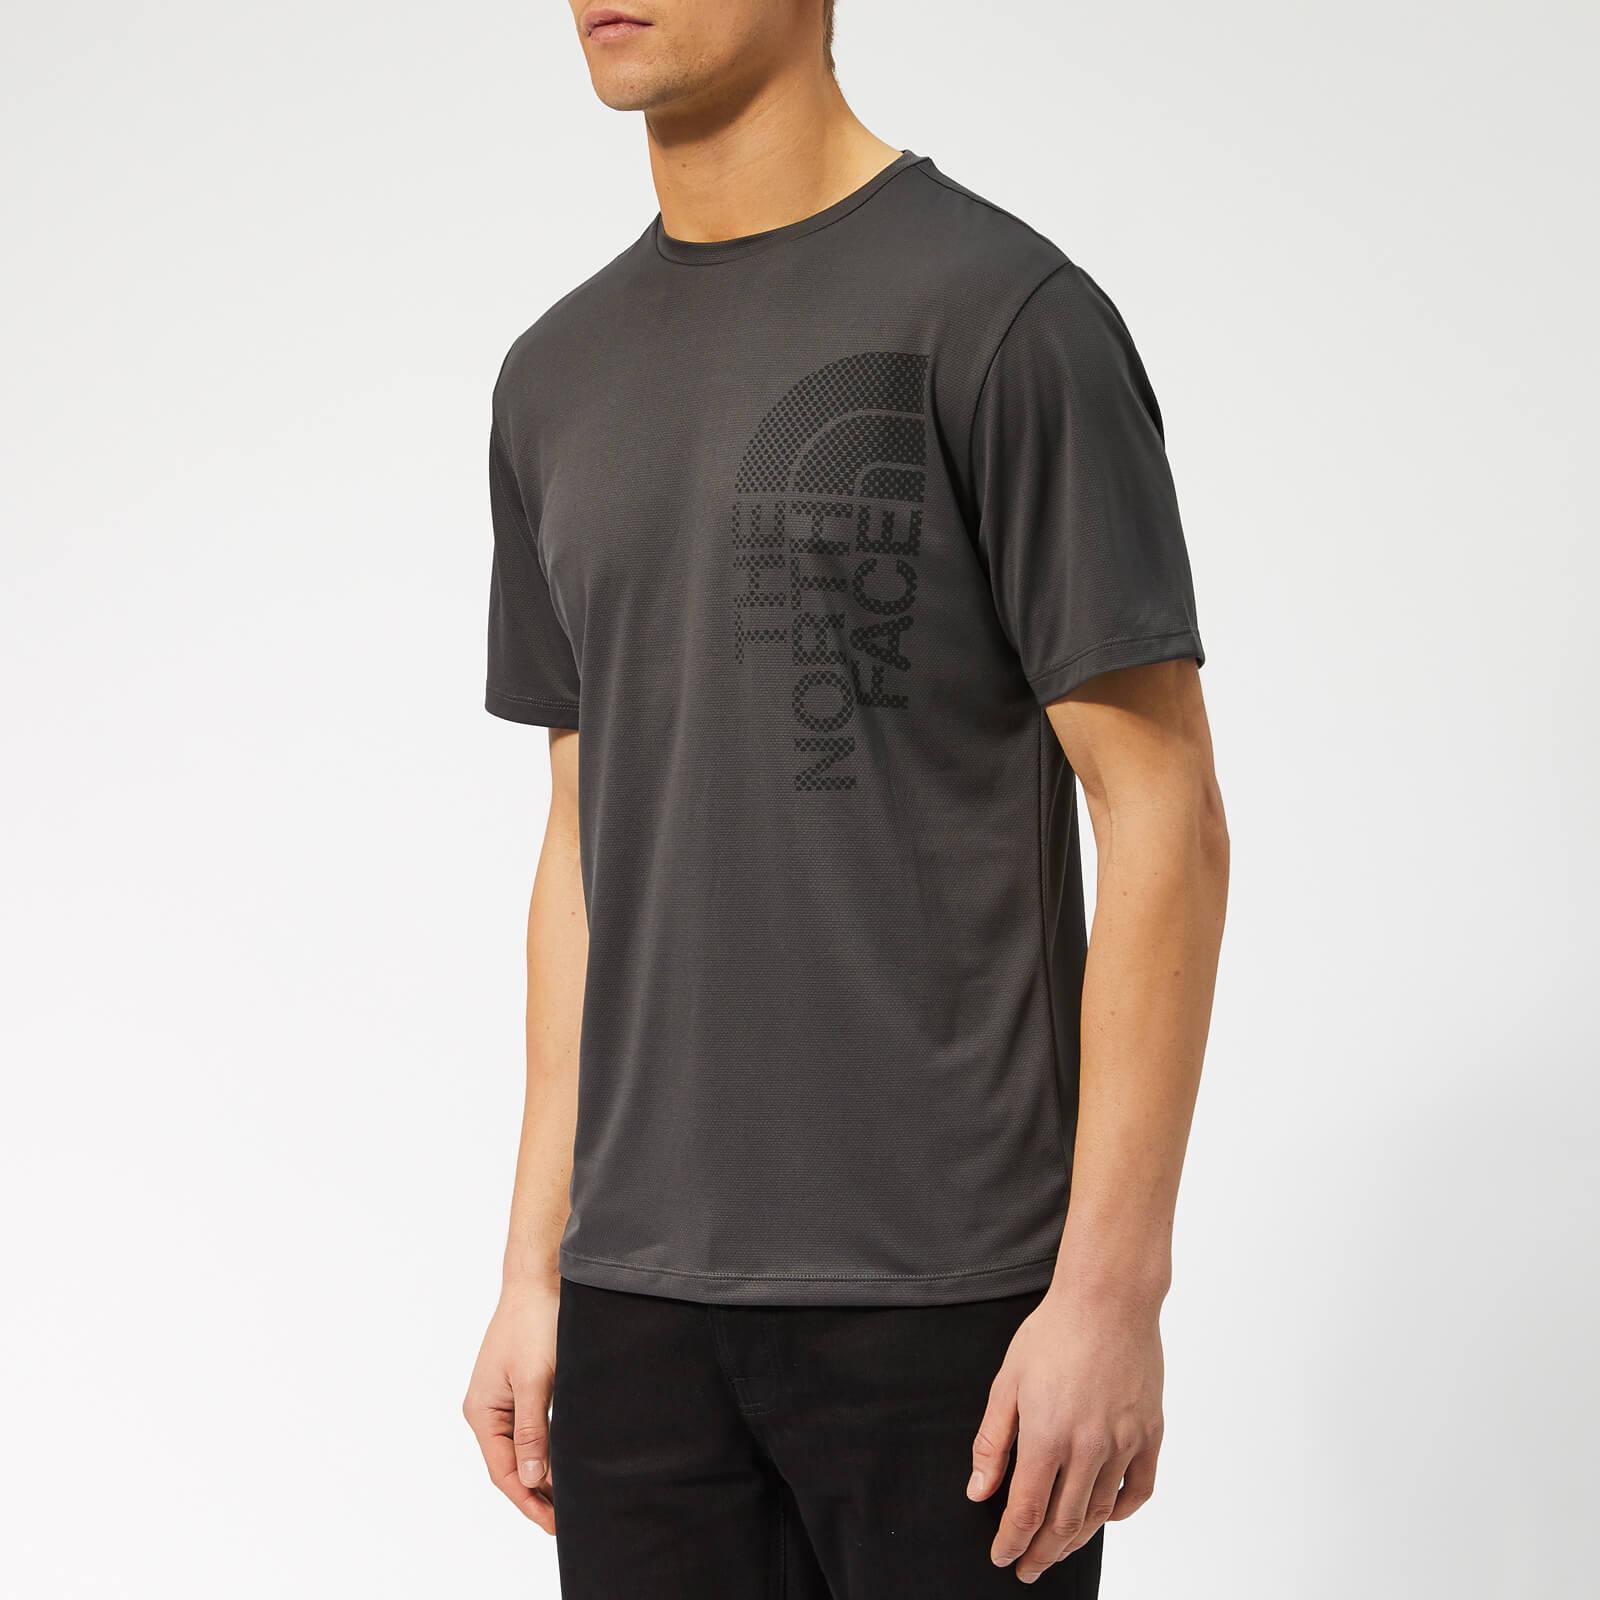 7f73bd6ecb The North Face Ondras Short Sleeve T-shirt in Gray for Men - Lyst